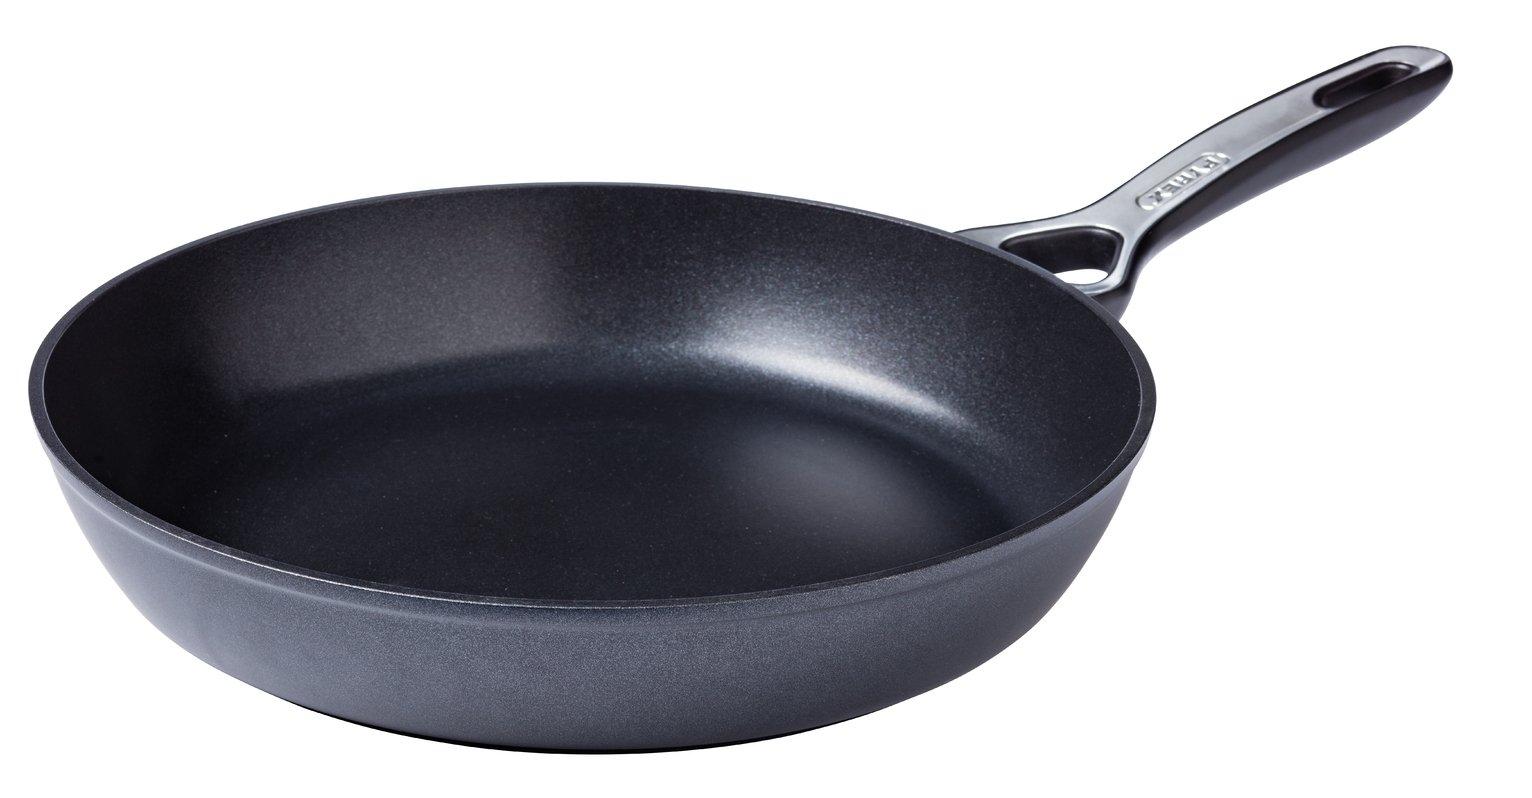 Pyrex Origin 28cm Frying Pan